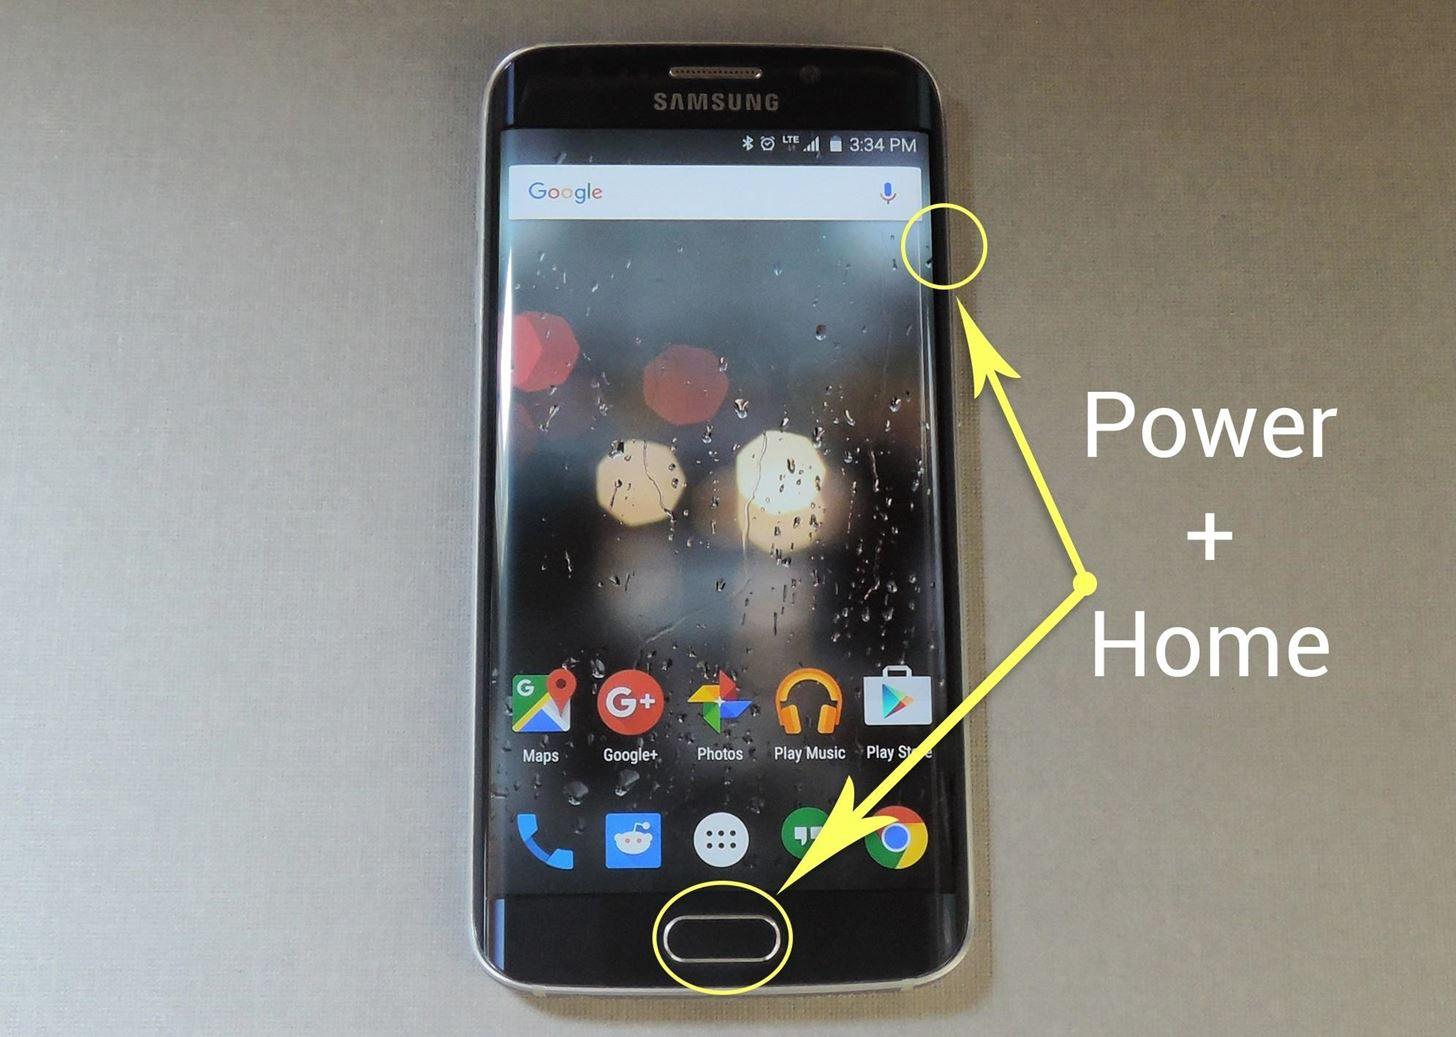 forma basica de hacer un screenshot en Android